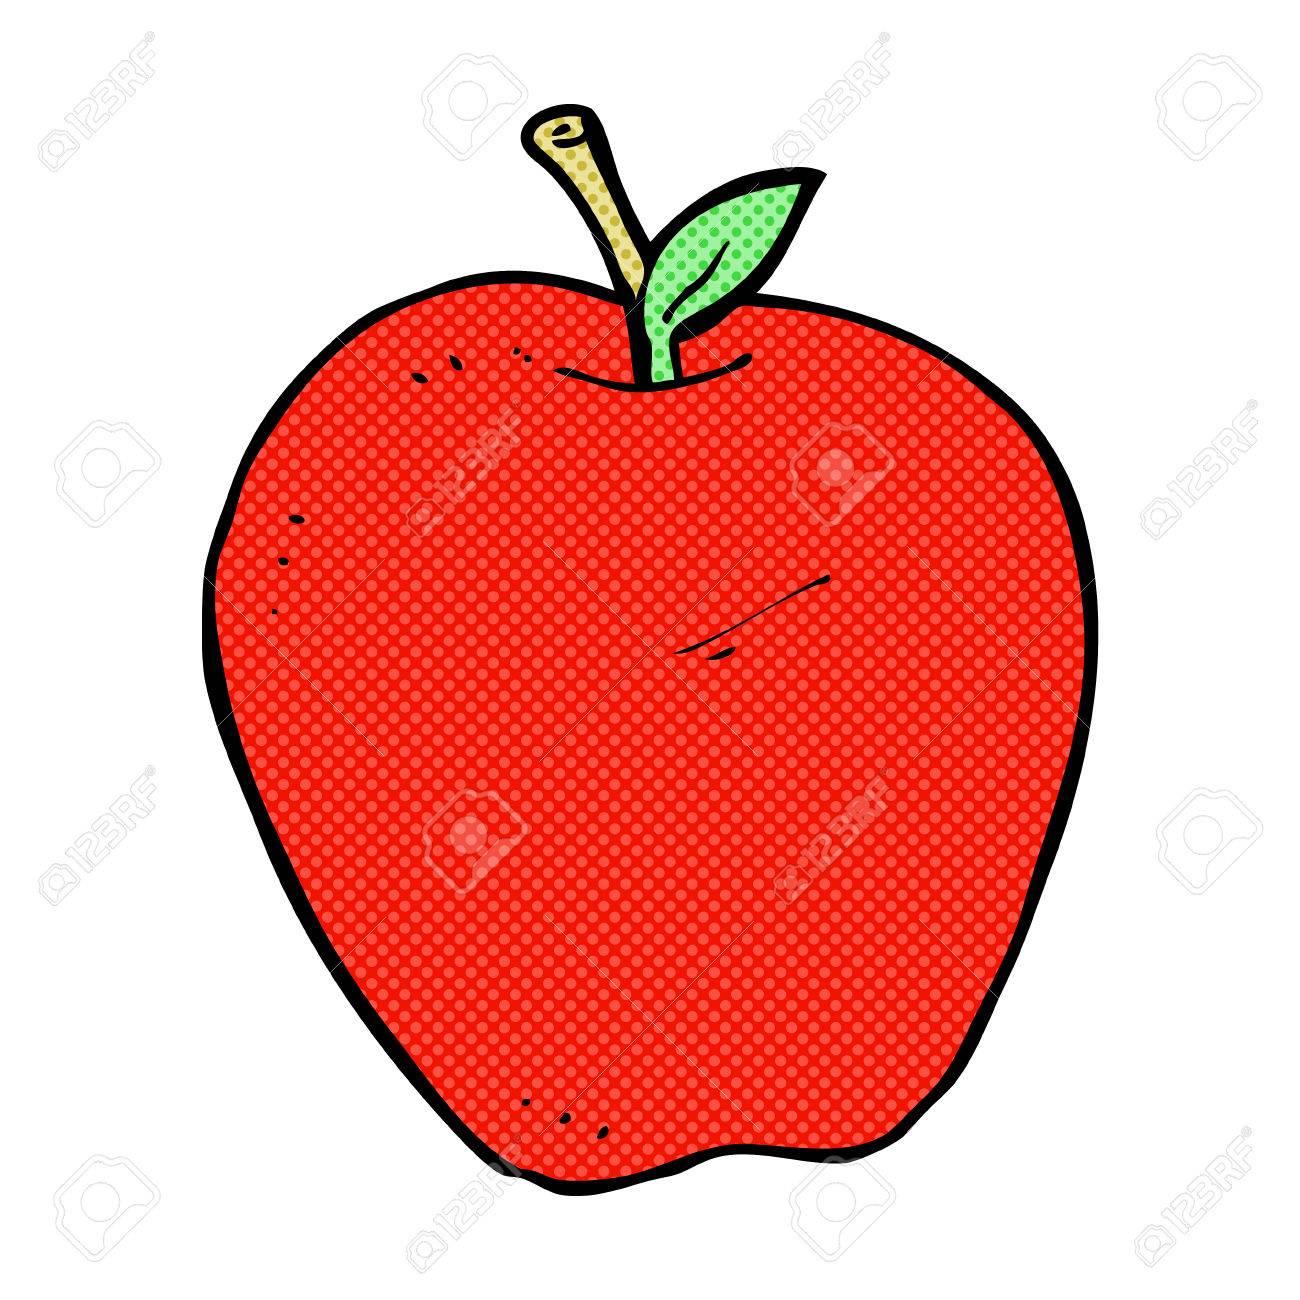 retro comic book style cartoon apple - 36641426